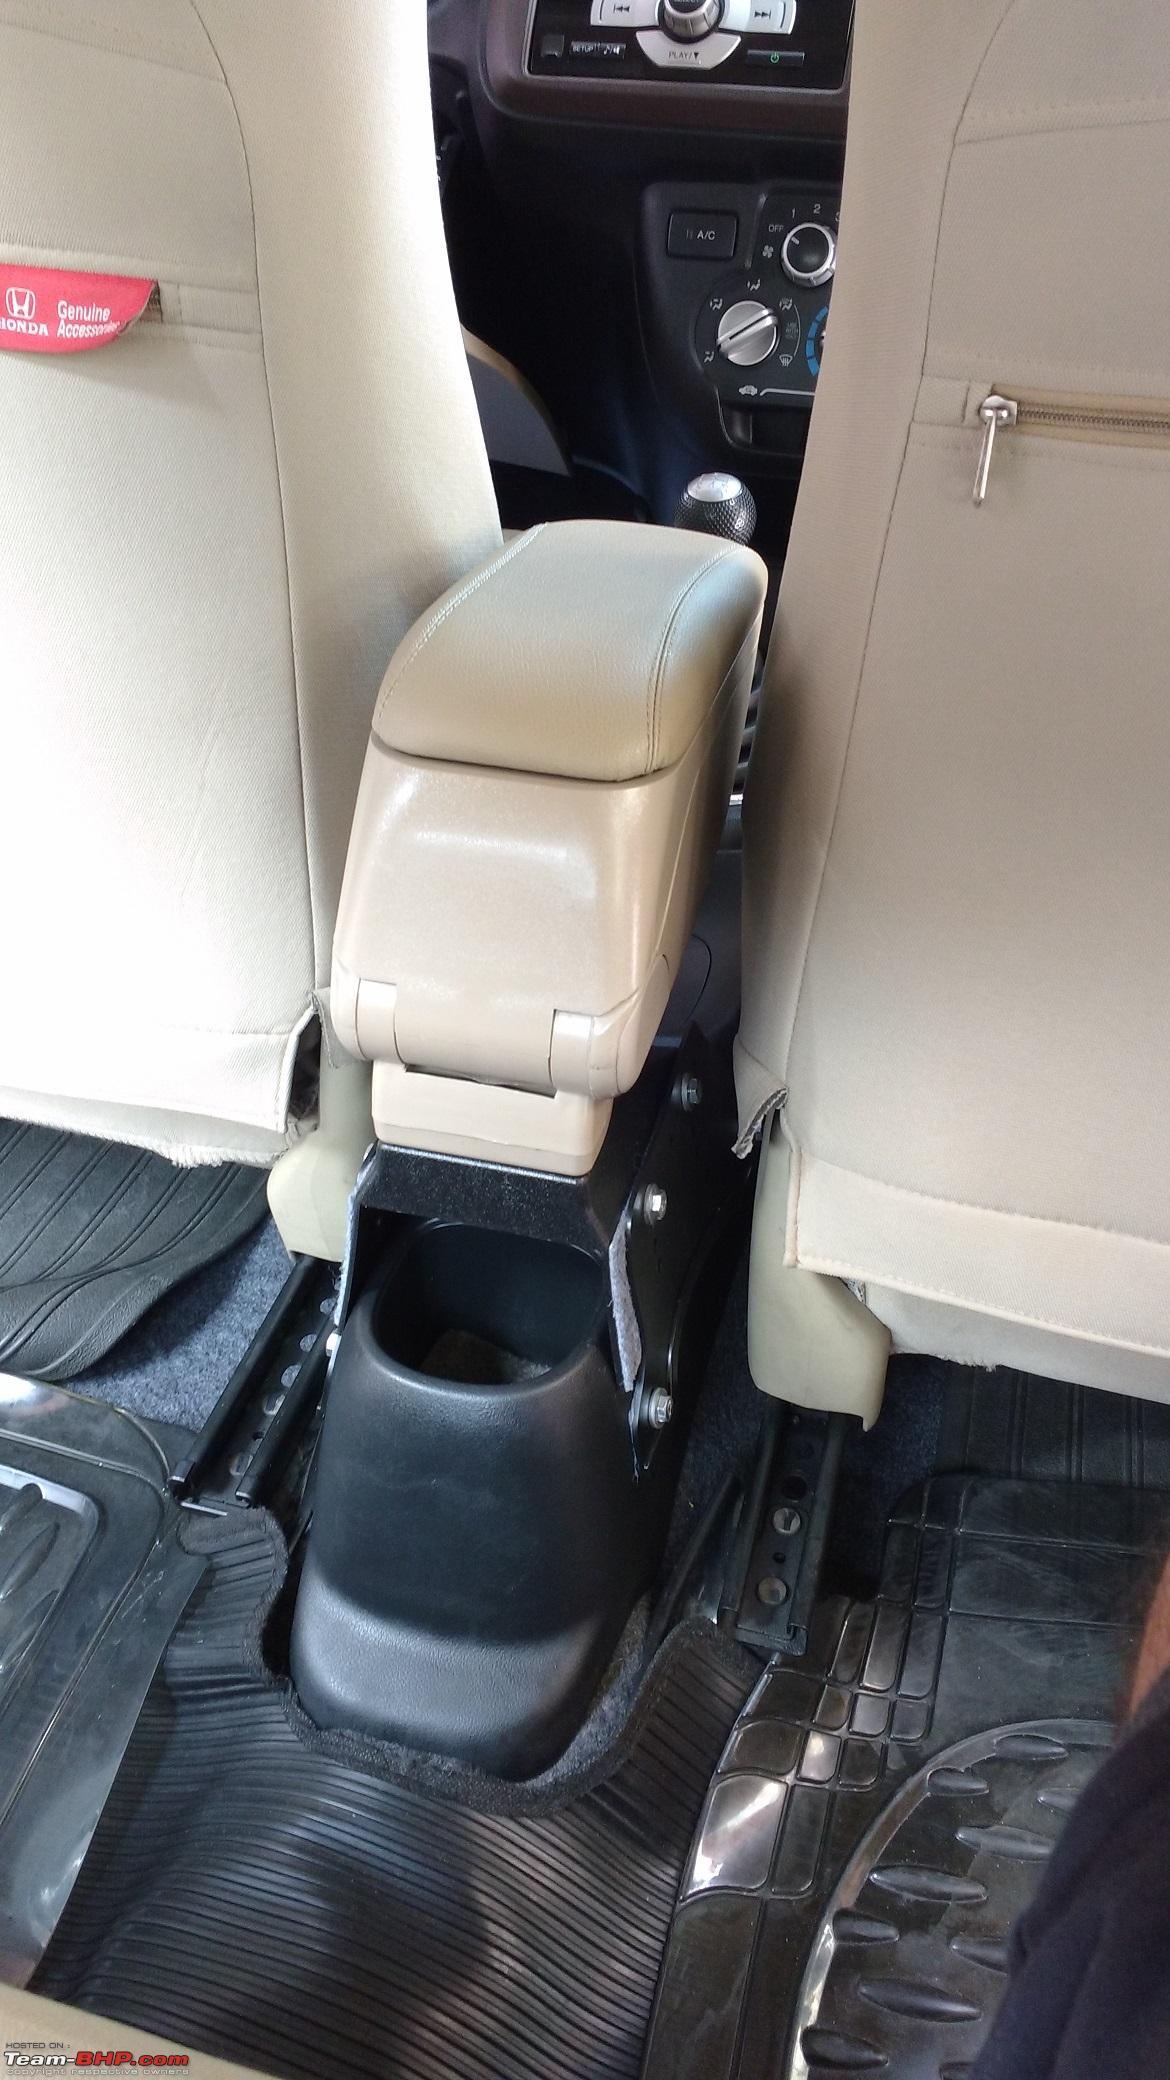 Honda Brio Diy Driver S Armrest With Felt Lined Storage